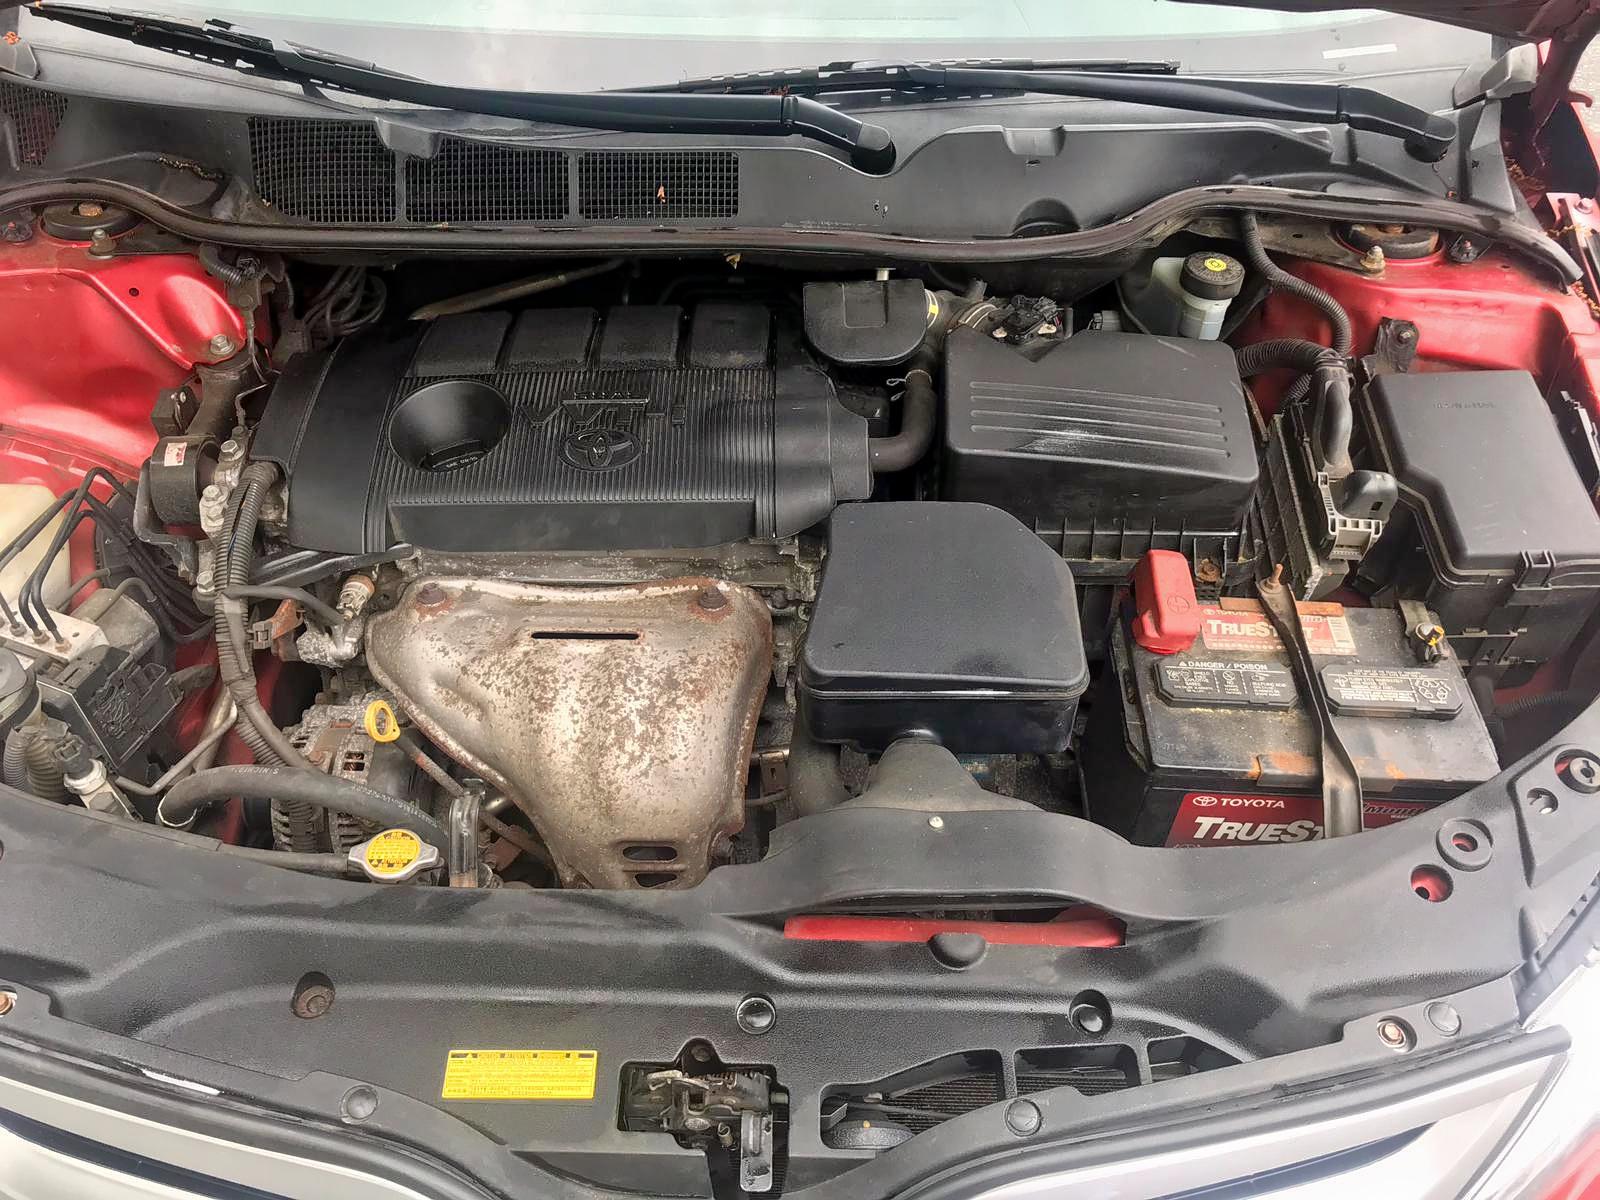 2013 Toyota Venza Le 2.7L inside view